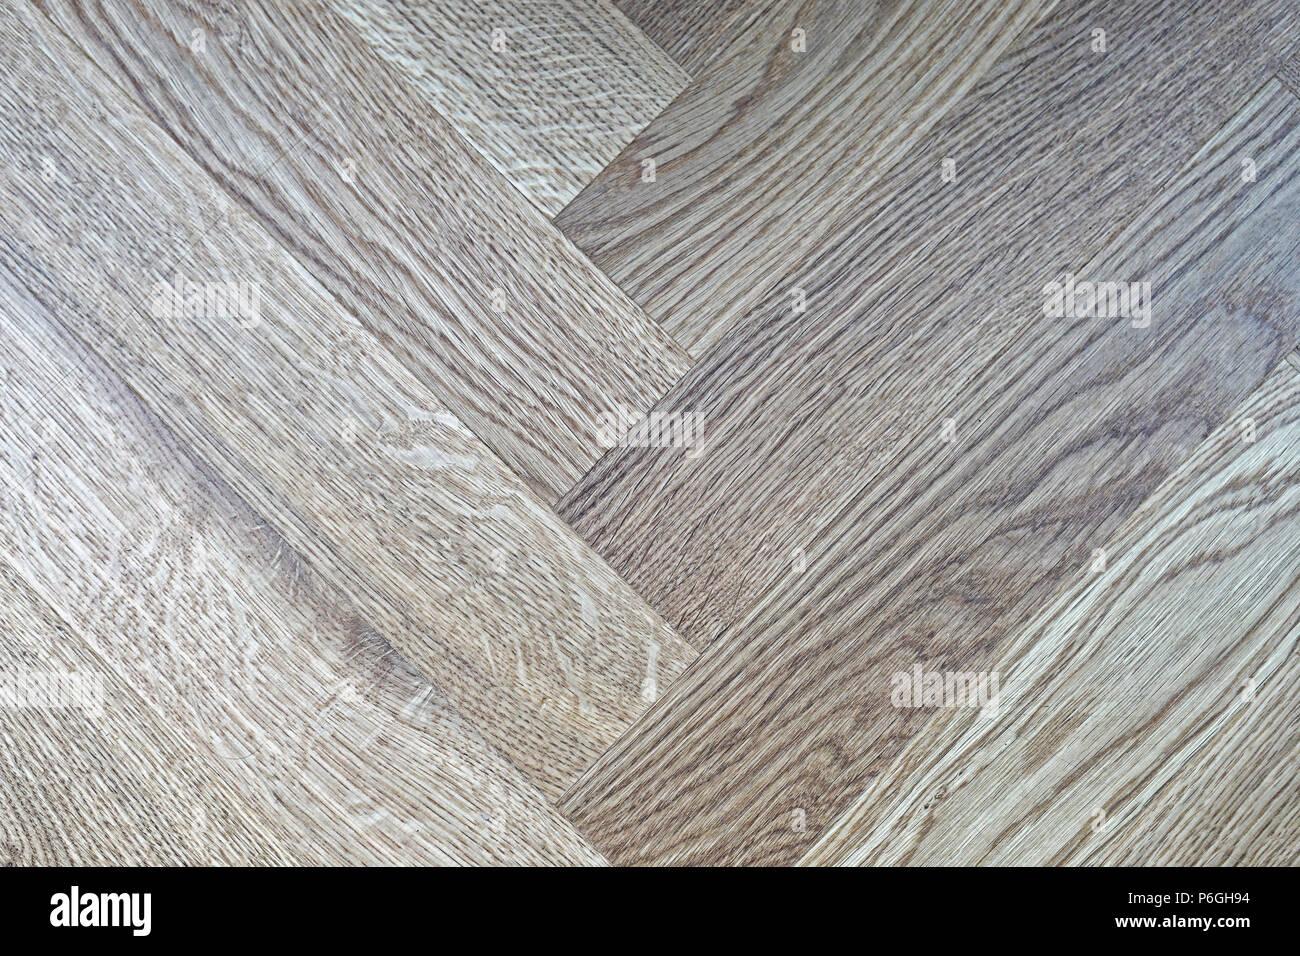 Close Up Shot Of Parquet Floor Tiles Stock Photo 210577168 Alamy